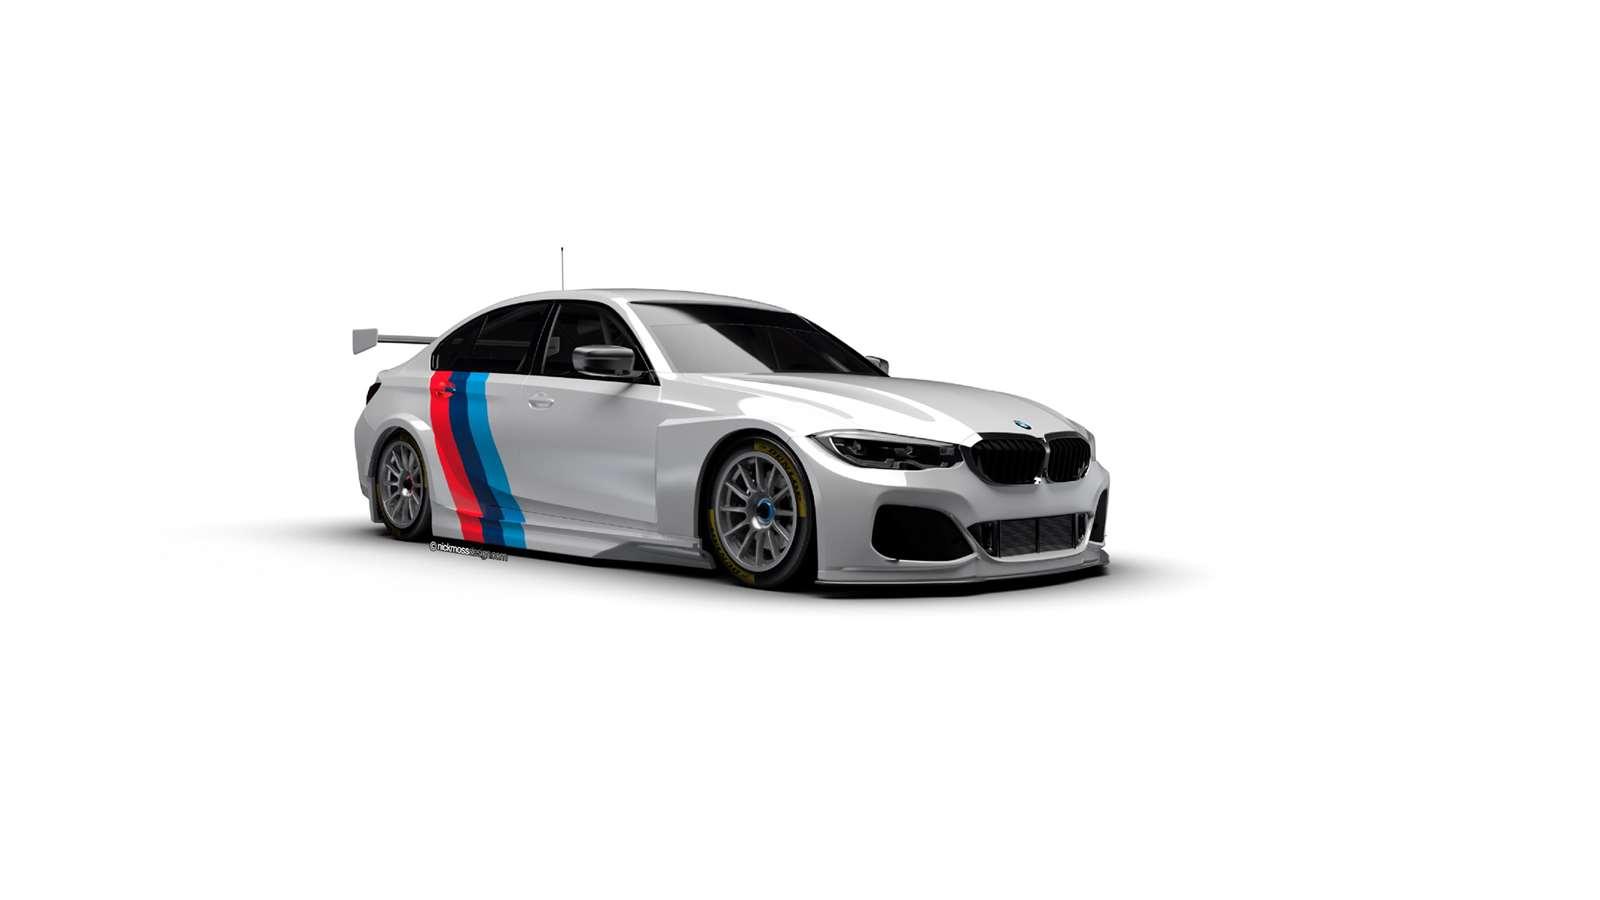 Andrew Jordan My 2019 Bmw 3 Series Btcc Car